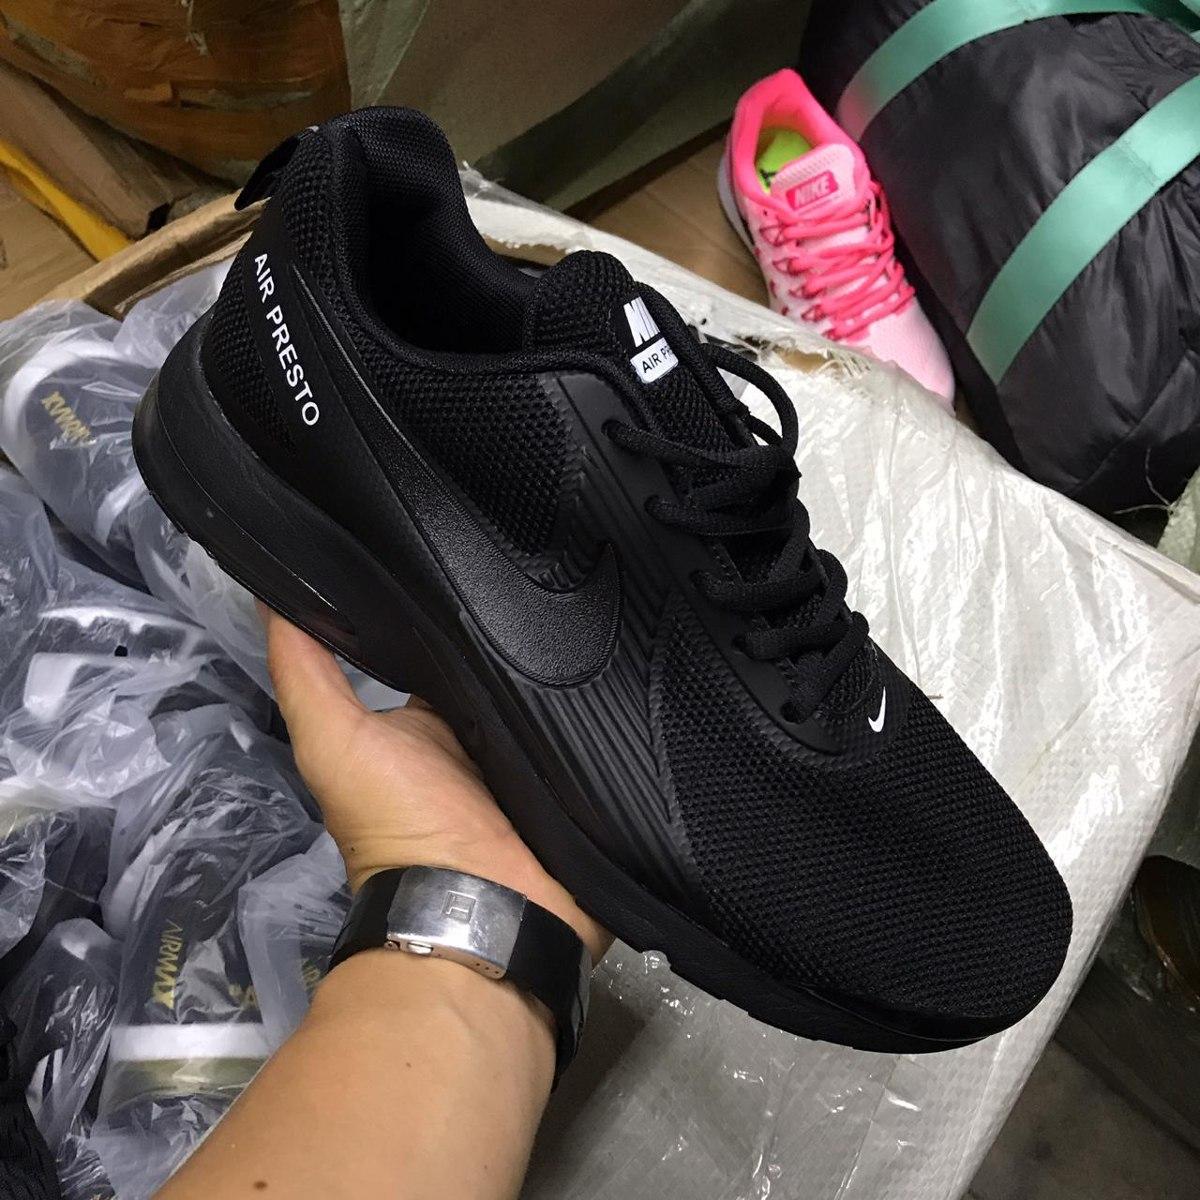 huge selection of 430bb 263e2 inexpensive zapatos nike air presto full negro 2019. cargando zoom. 786cd  c9f2a